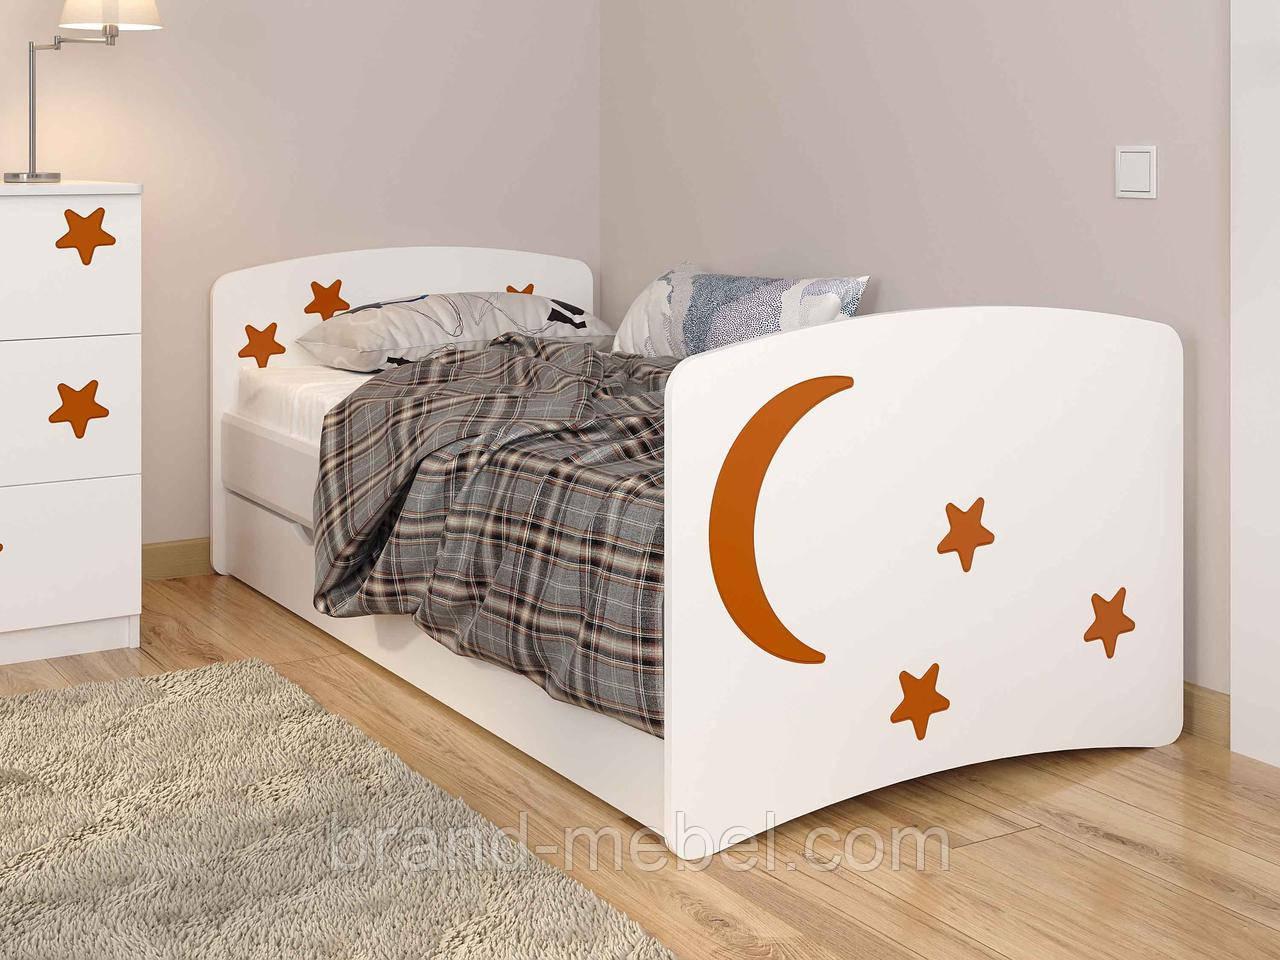 Кровать детская Звезды серии Fly / Ліжко дитяче Зорі серії Fly